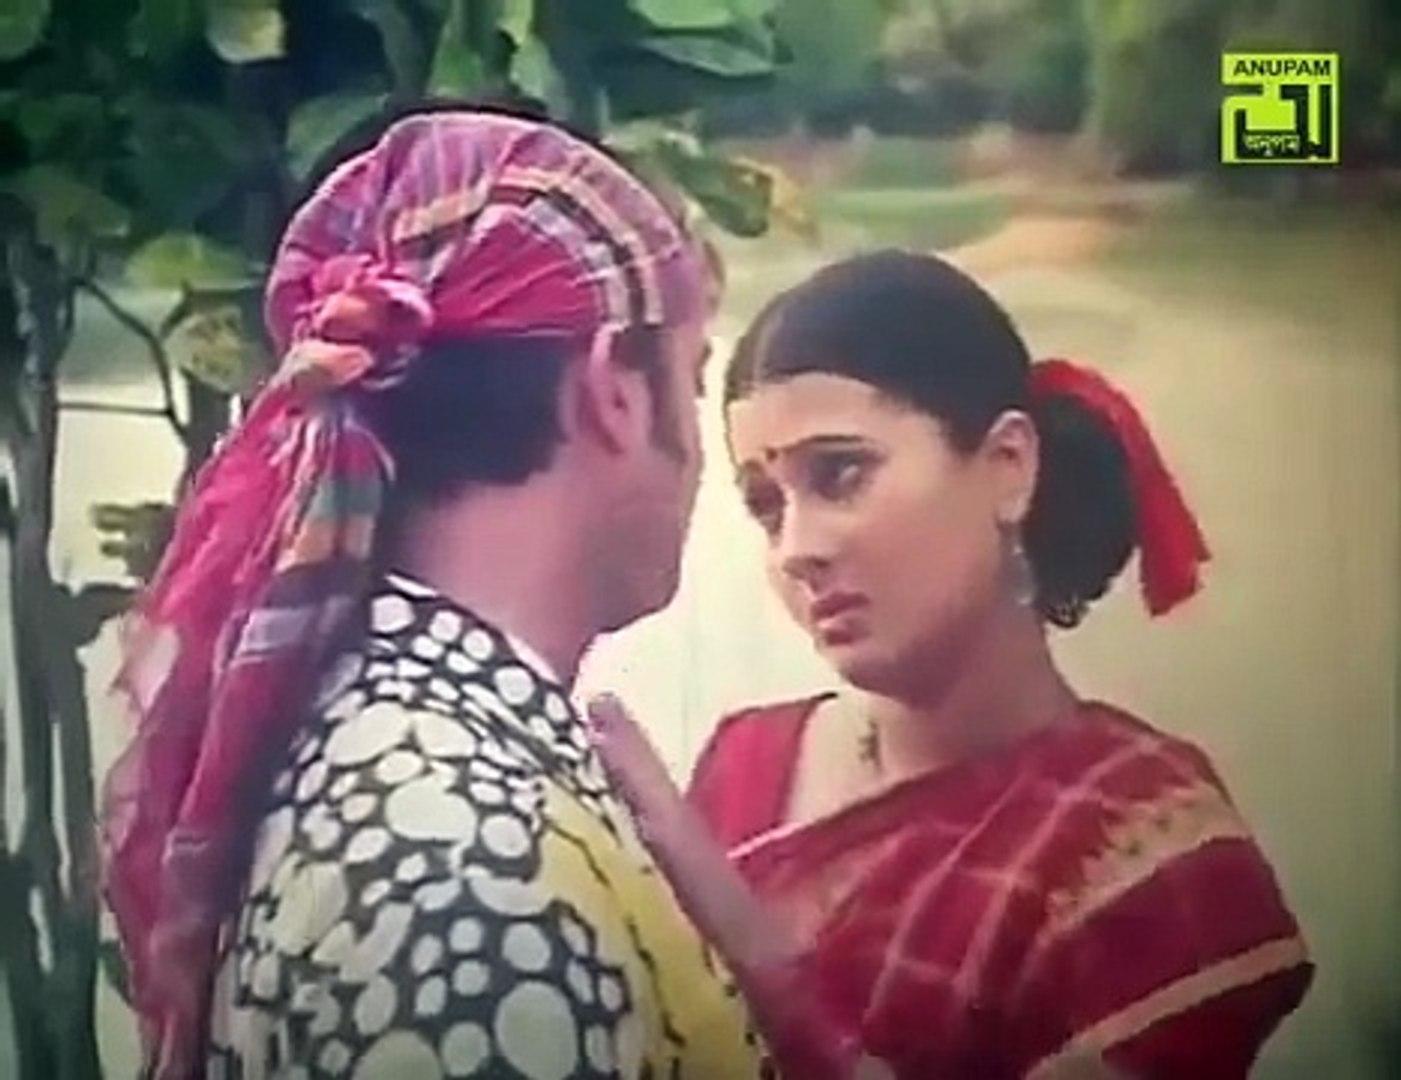 Ei Tumi Sei Tumi Jake Ami Cai _ এই তুমি সেই তুমি যাকে আমি চাই _ Badha Bangla Movie _ Ft Riyaz, Purni